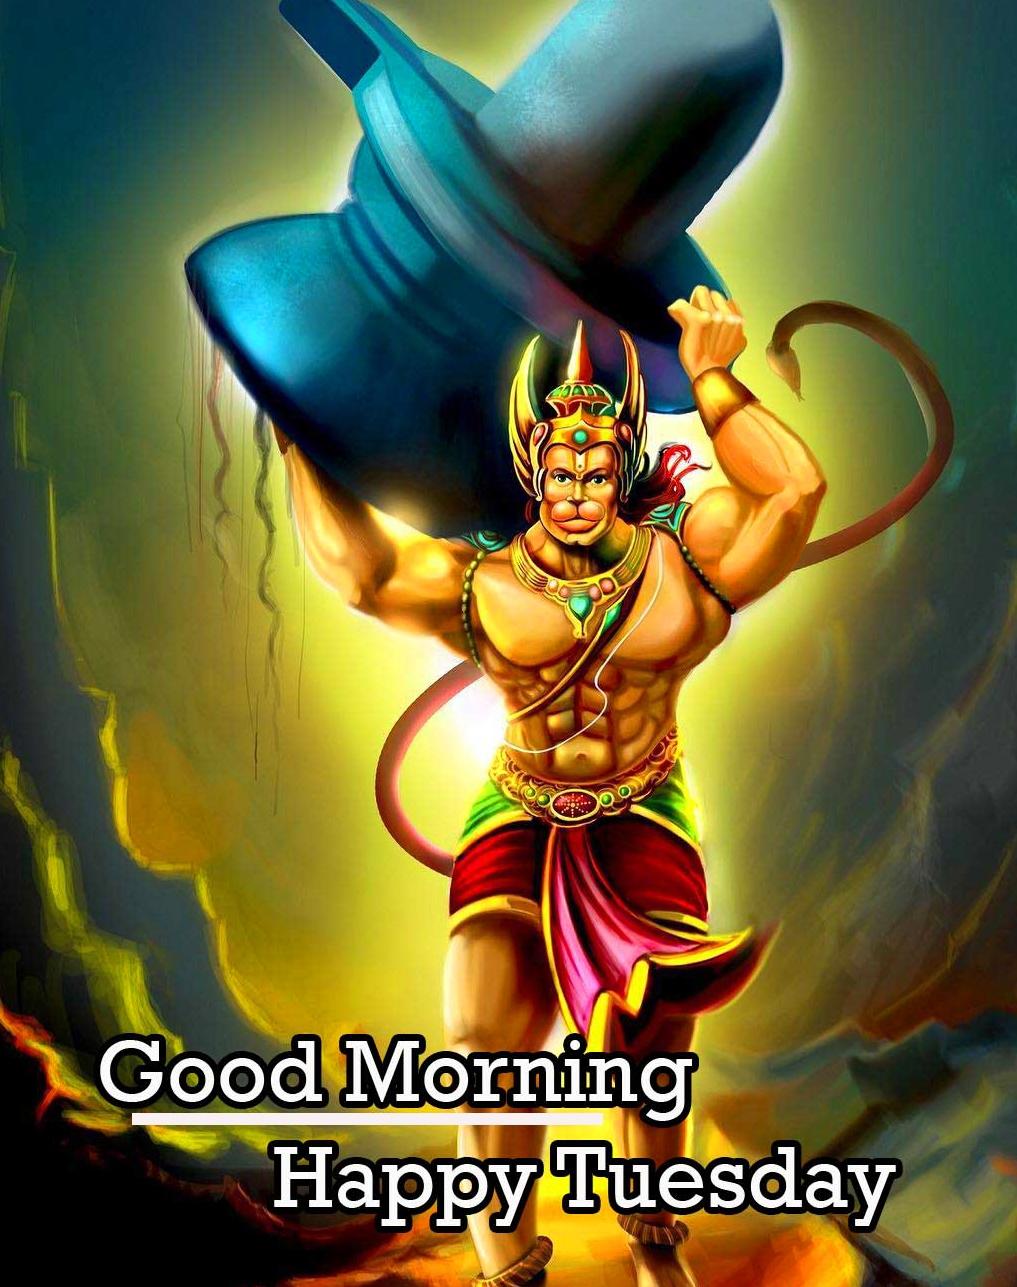 Good Morning Tuesday Hauman JI Images Pics for Status